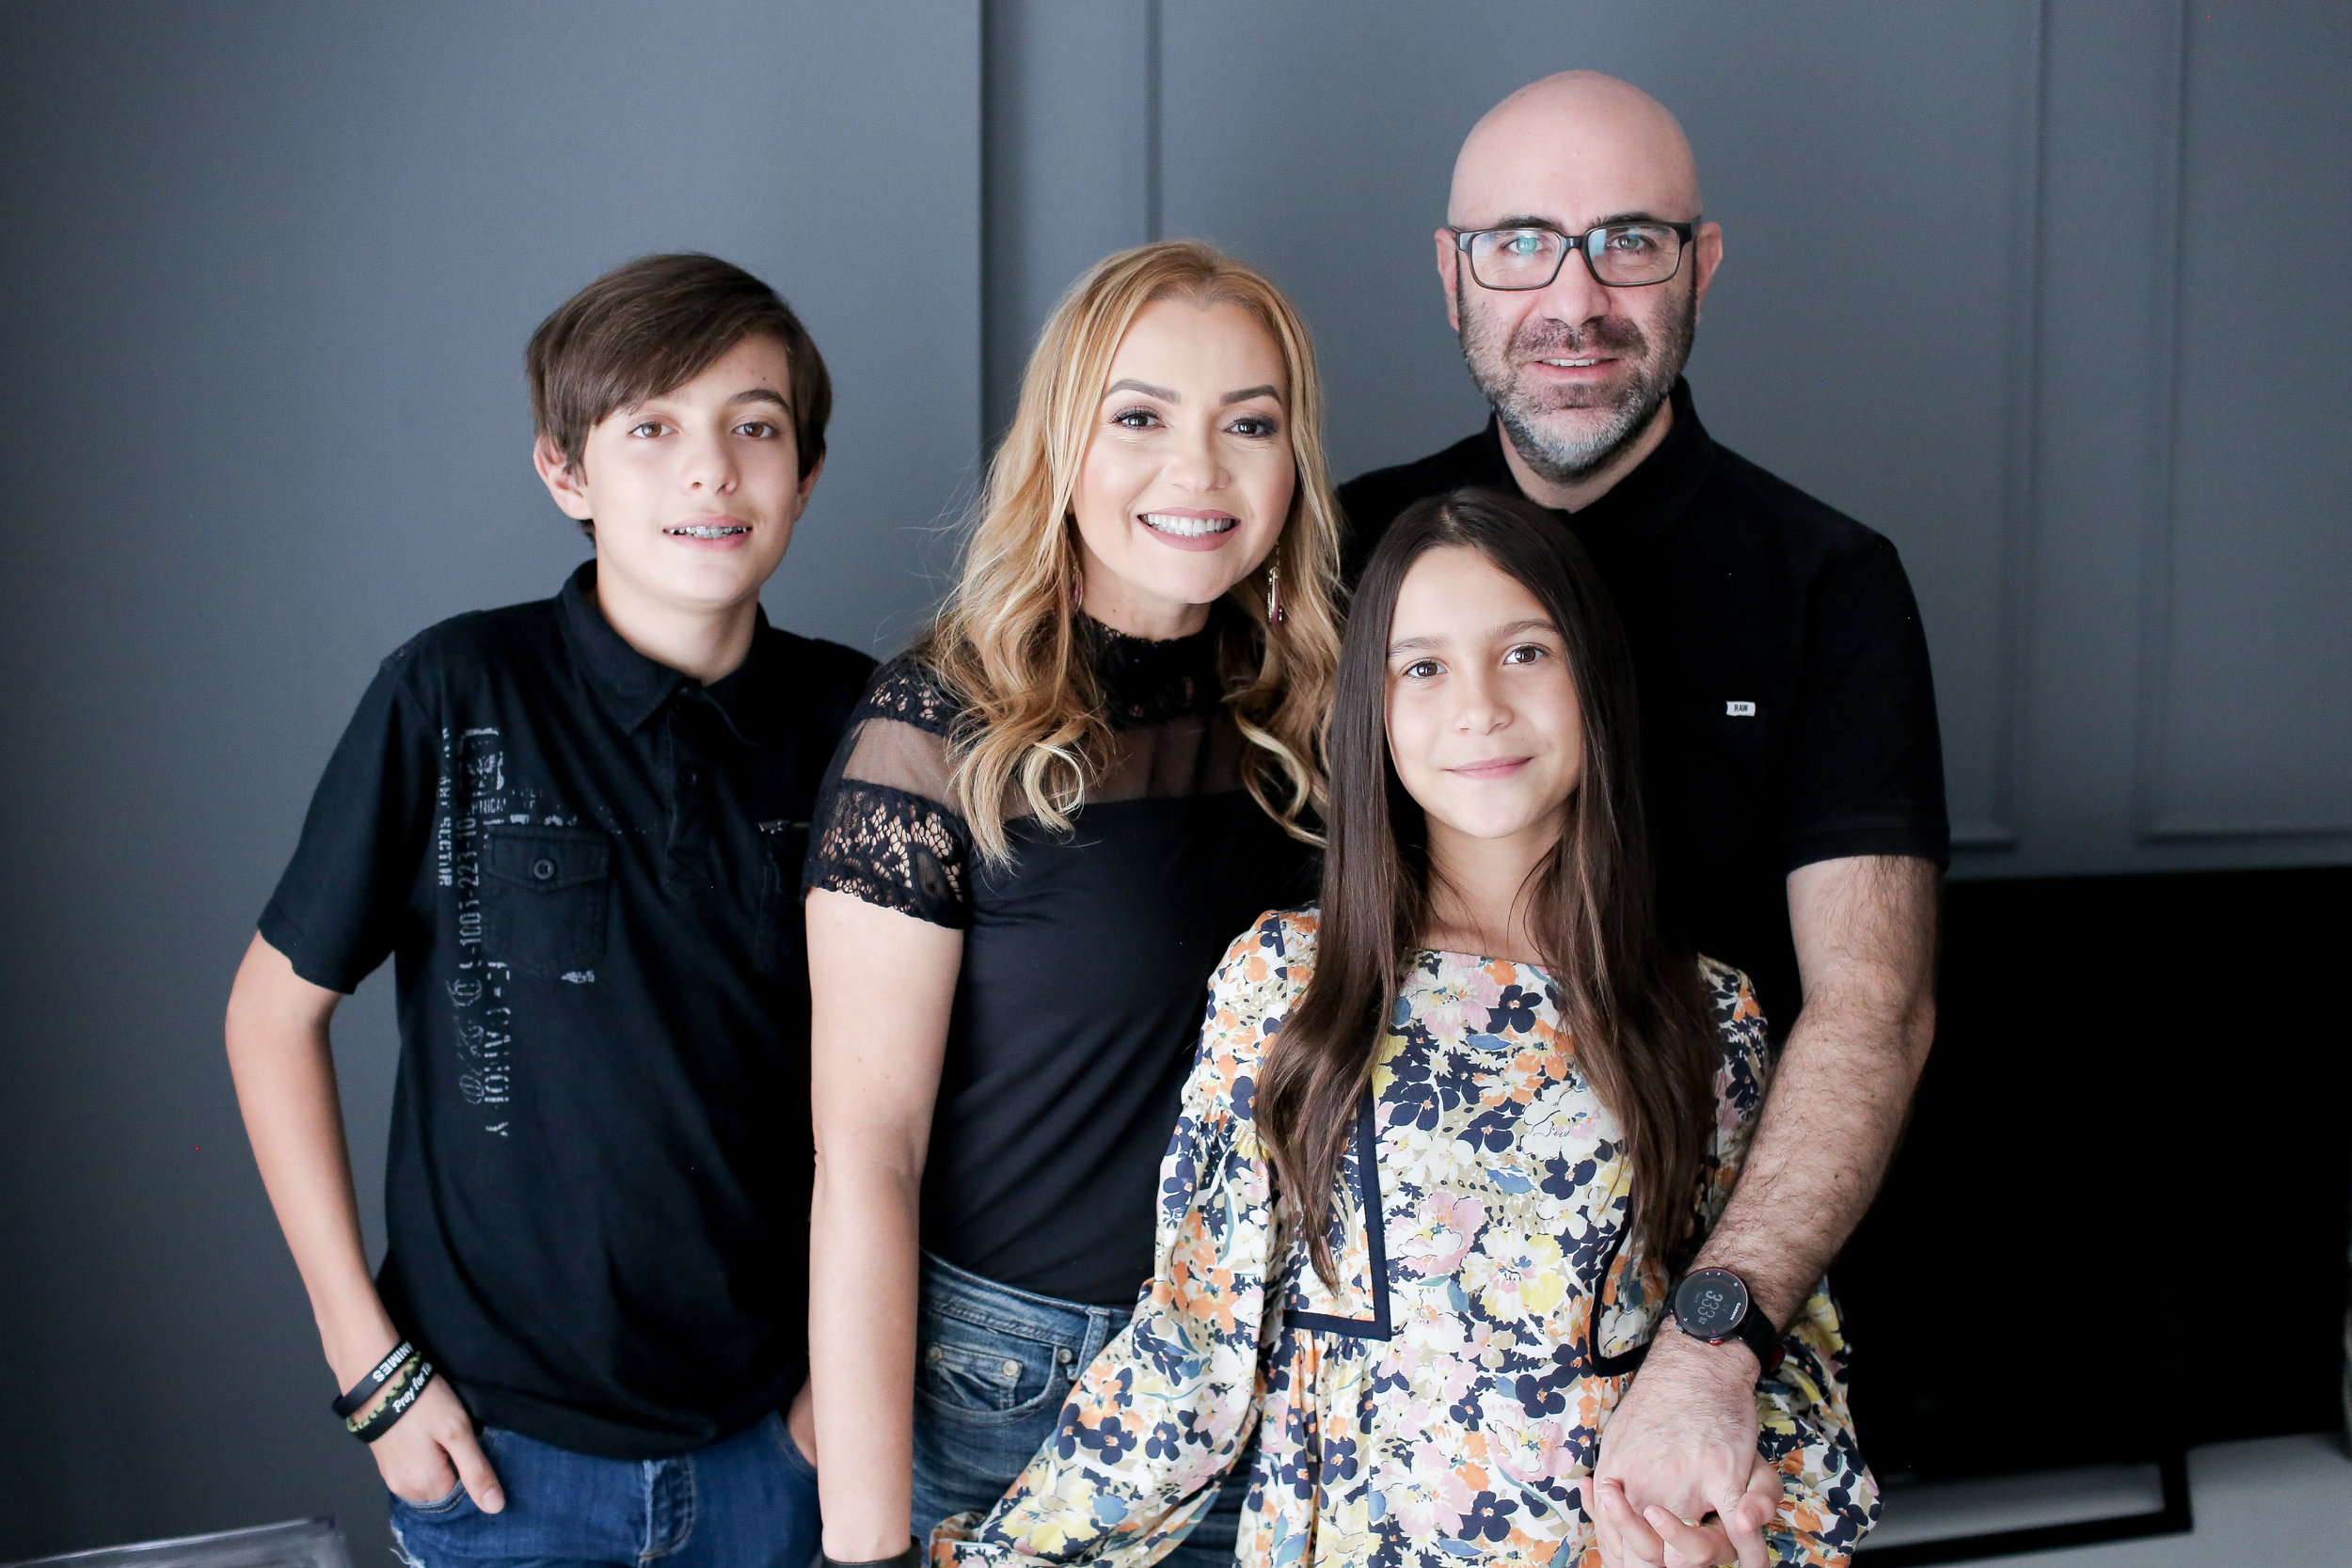 Garo,. Jordania, Eben, and Jordan